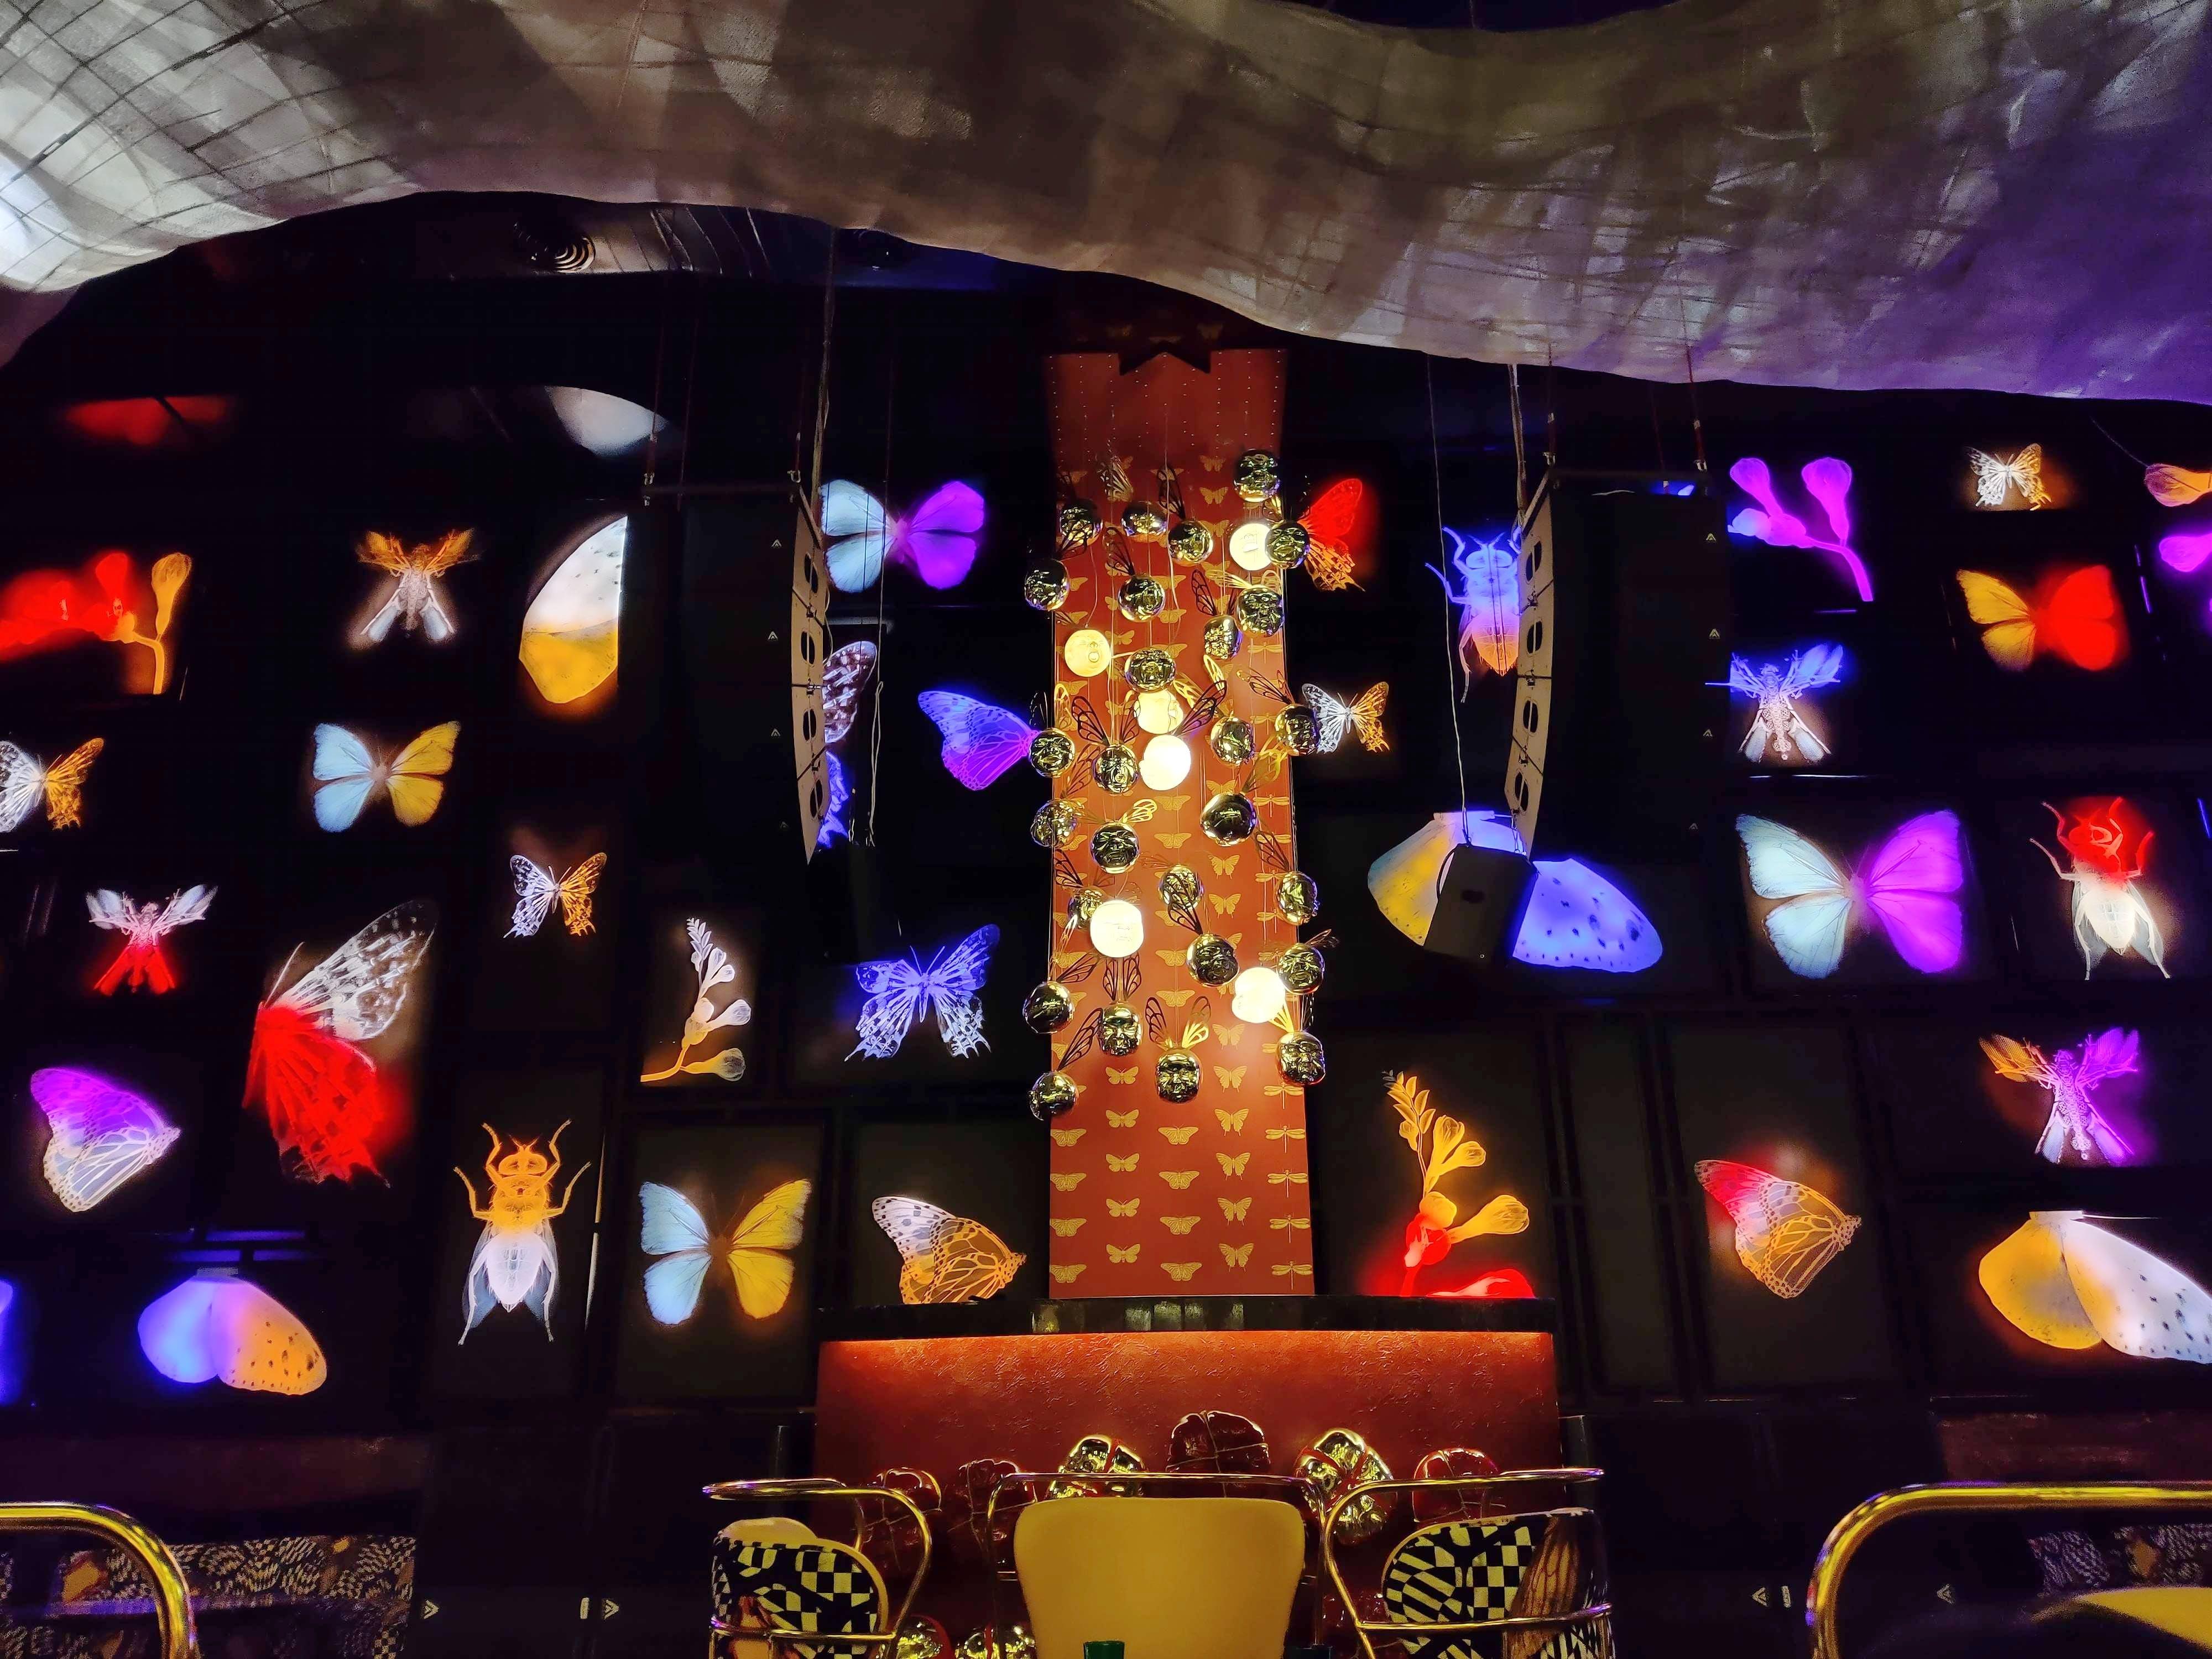 Bug Themed Décor & Culinary Hotspot At Dragonfly In Aerocity